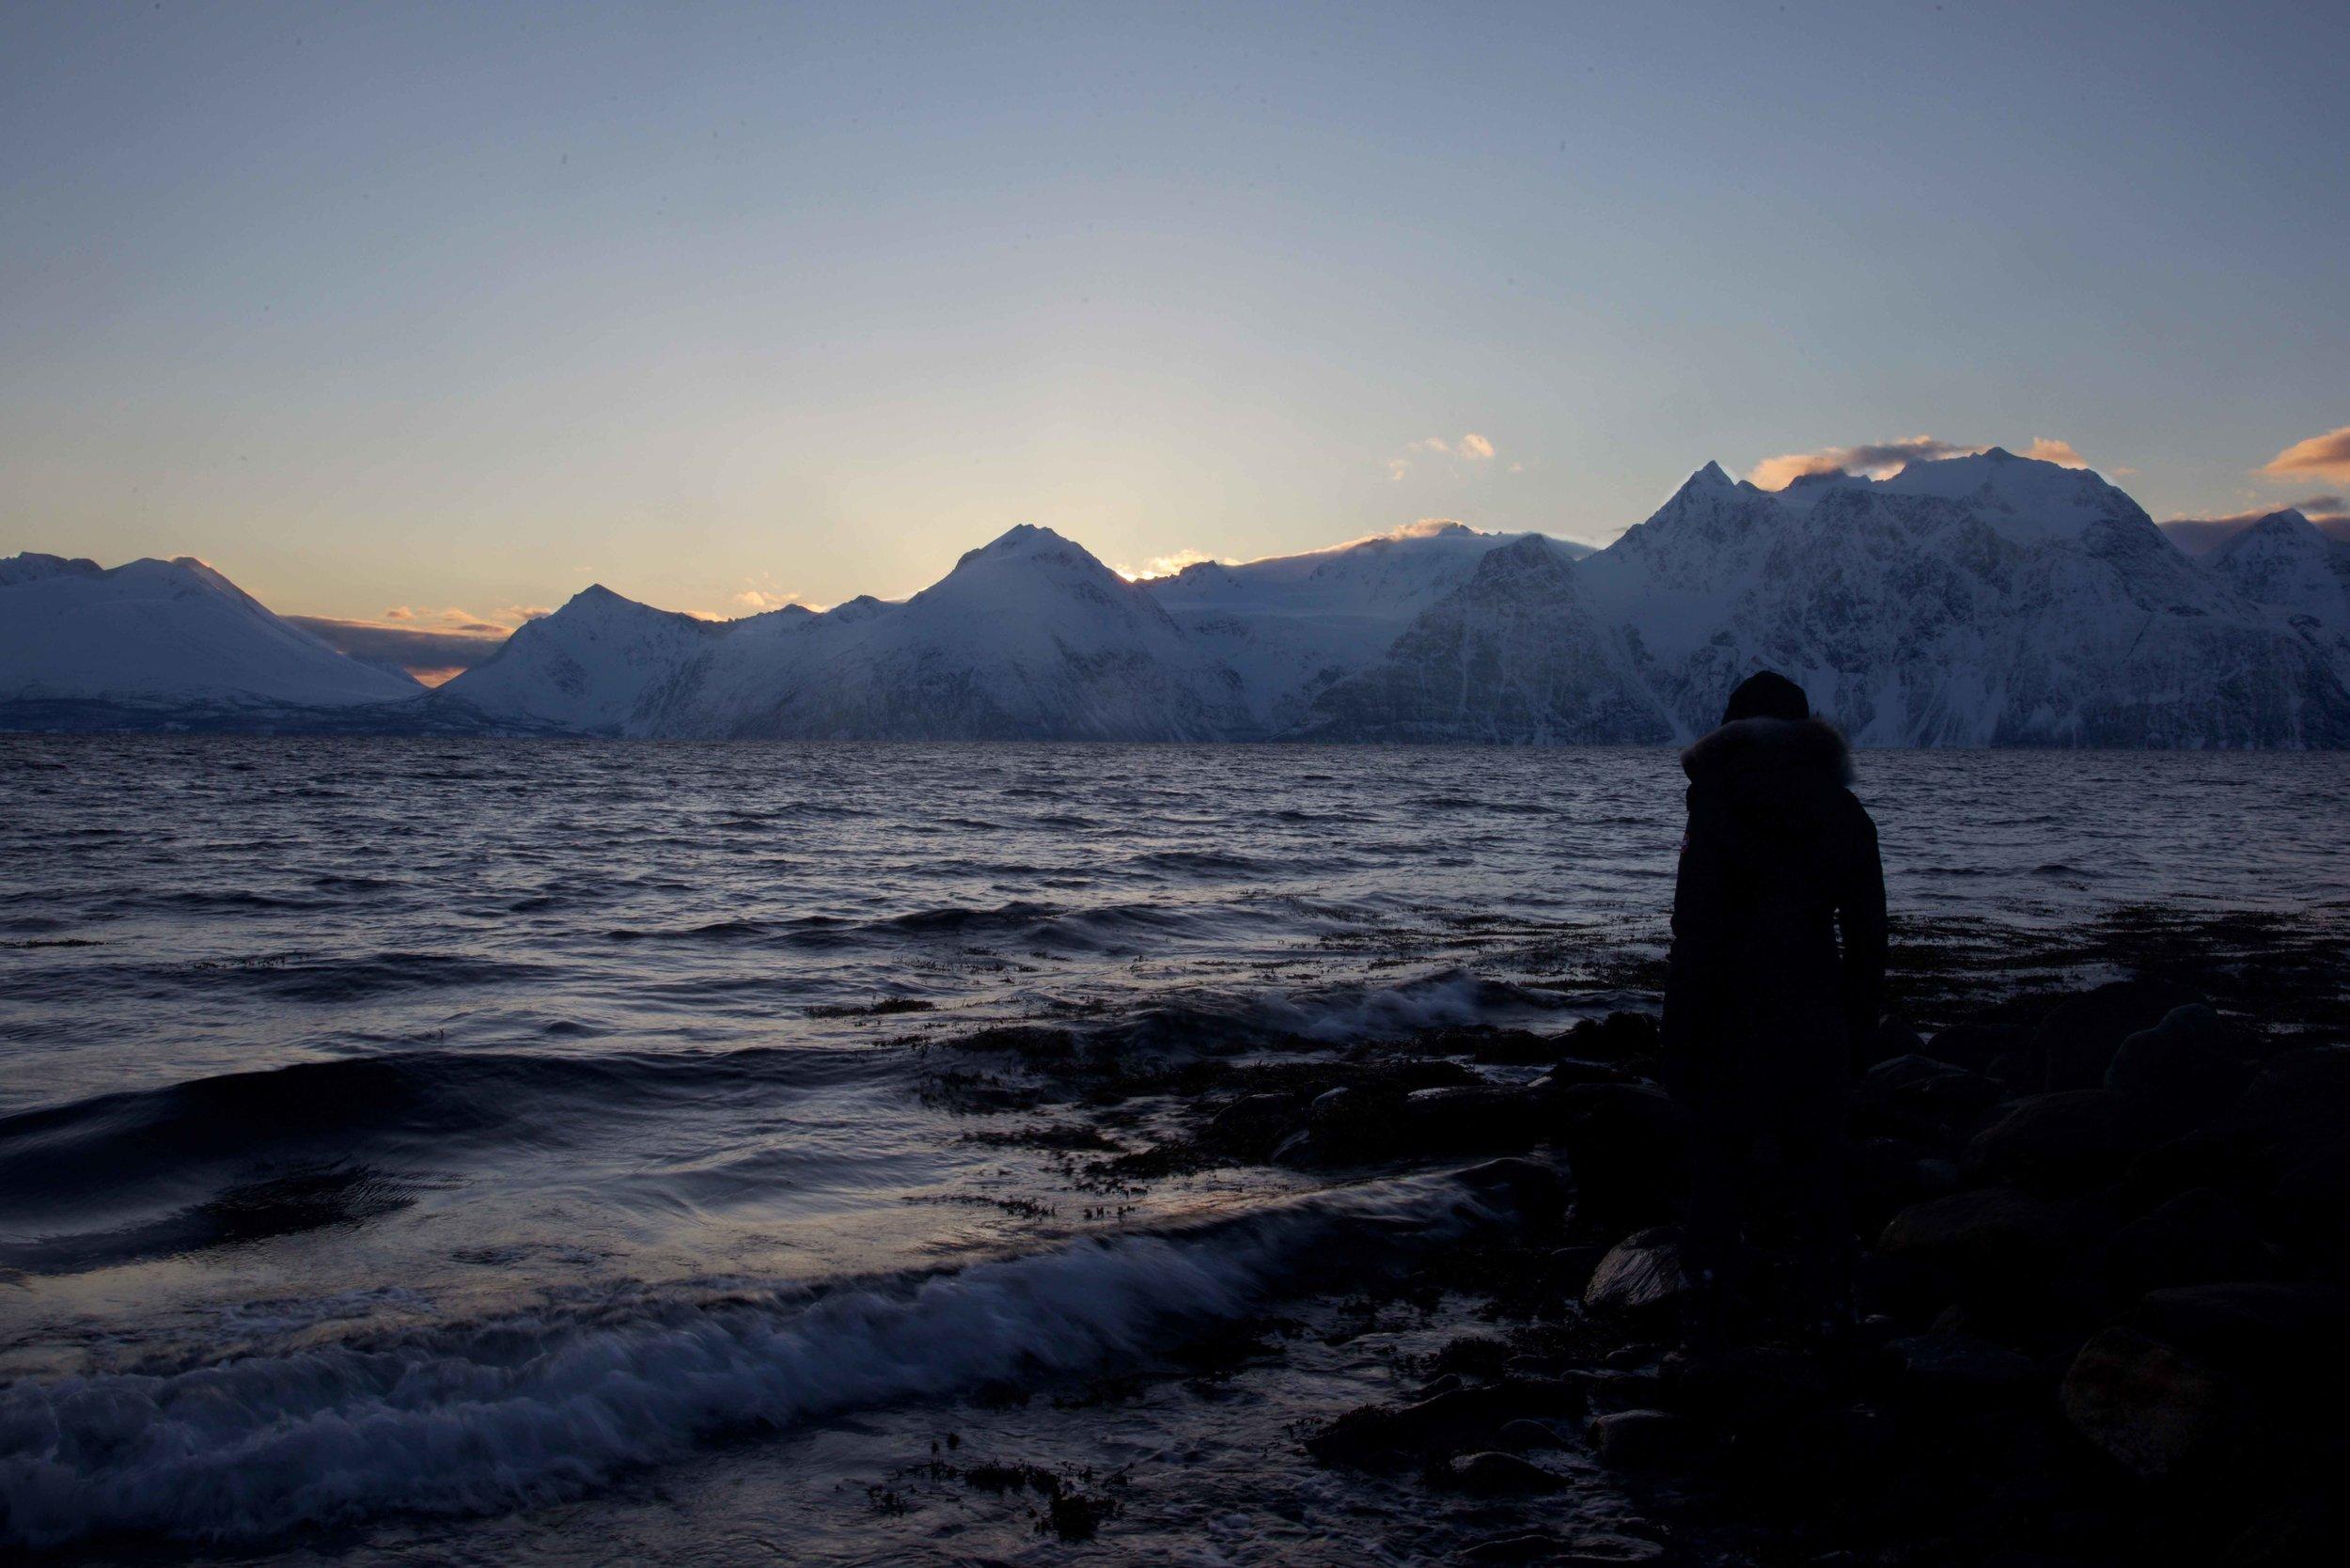 Arctic scenery, Lyngen Alps, Norwegian fjords, Lyngen Lodge, Arctic Circle, Norway. Image©thingstodot.com